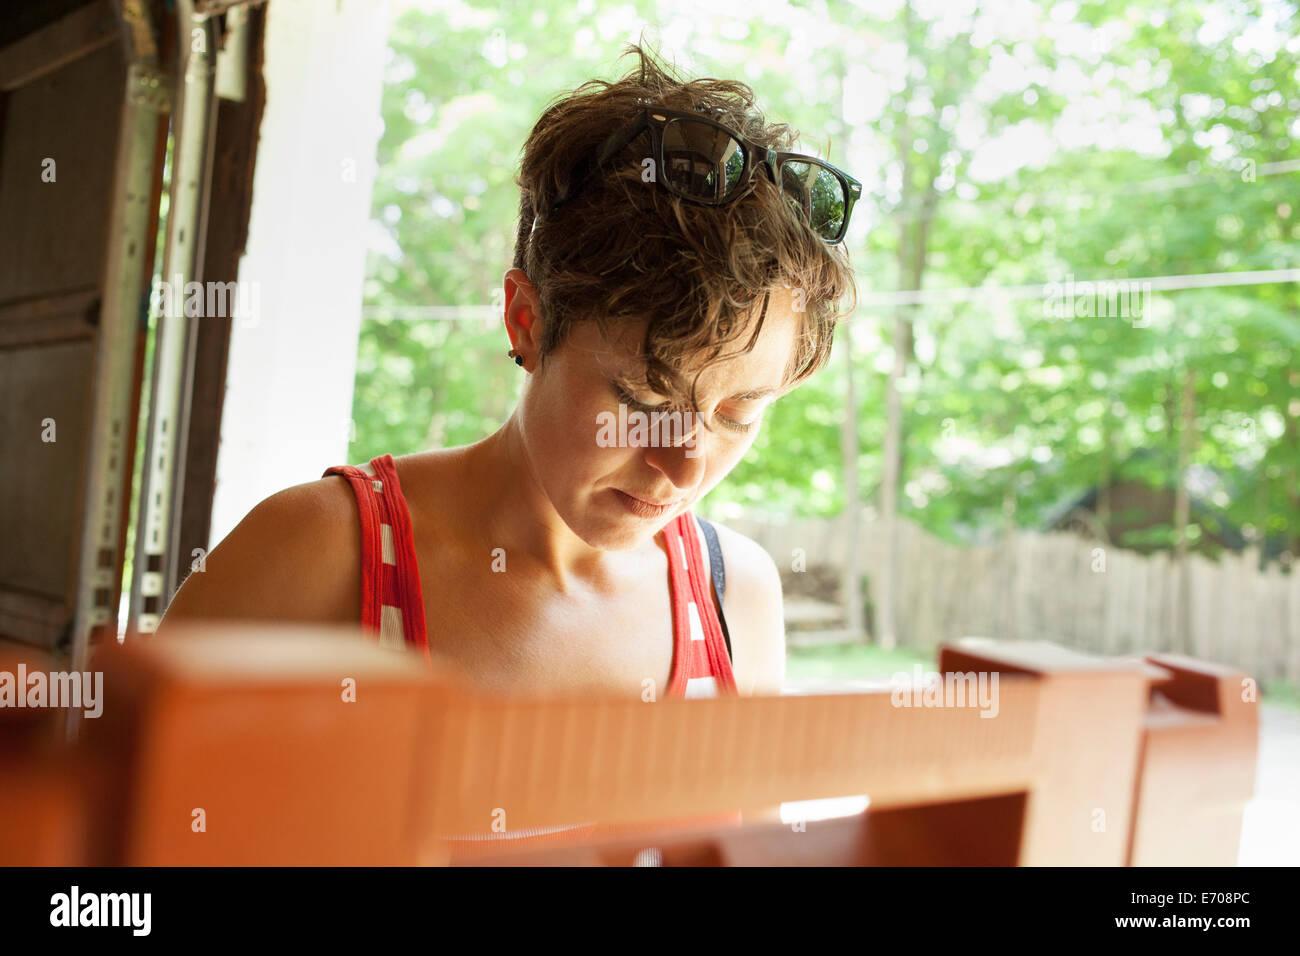 Mid adult woman restoring furniture in garage - Stock Image